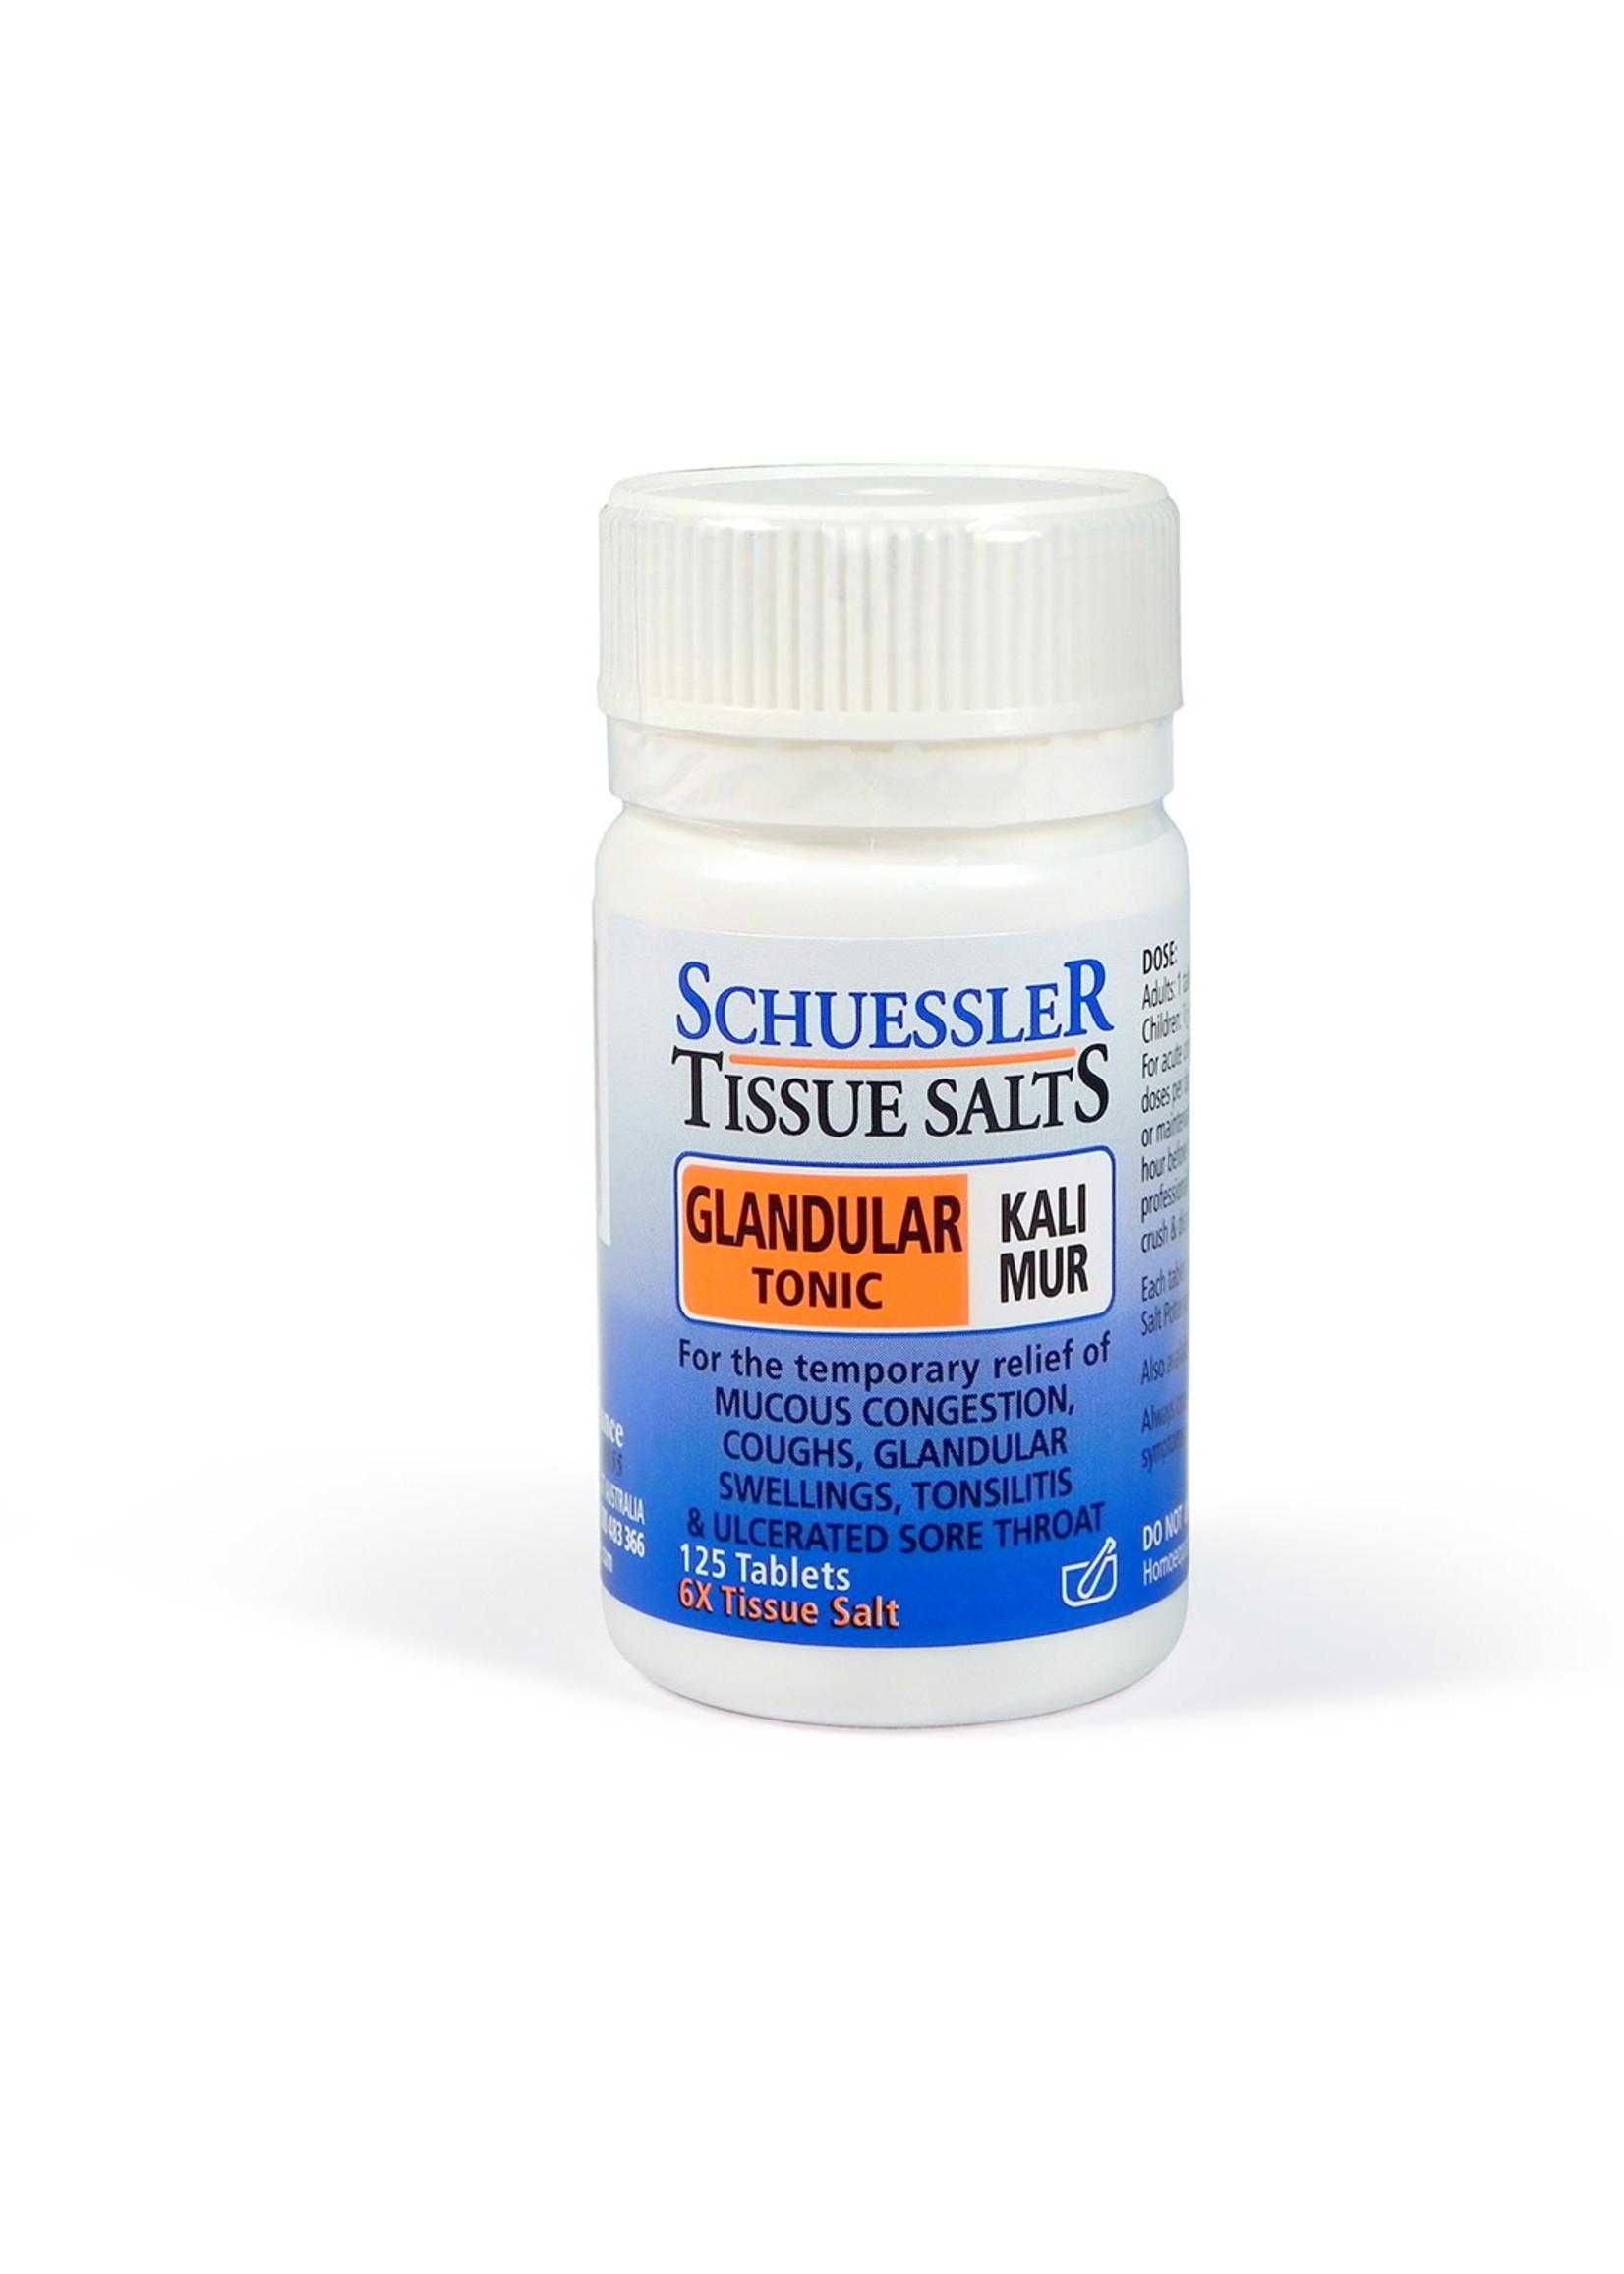 Martin & Pleasance Martin & Pleasance Schuessler Tissue Salts Kali Mur 125 Tab